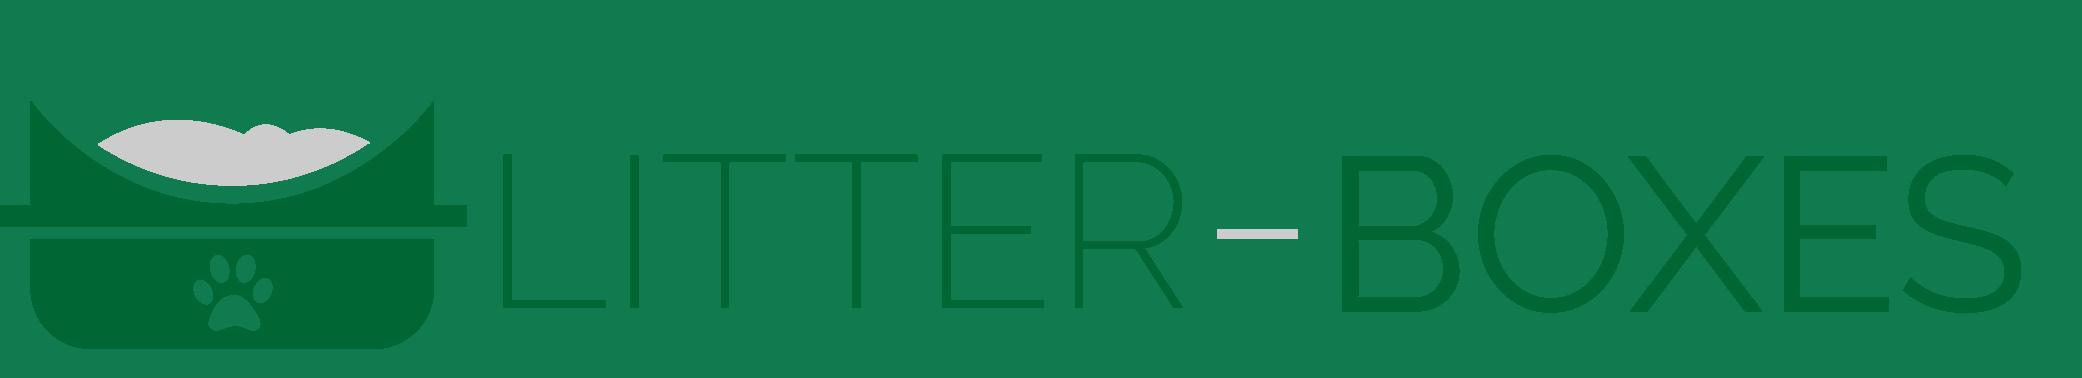 Litter-Boxes.com